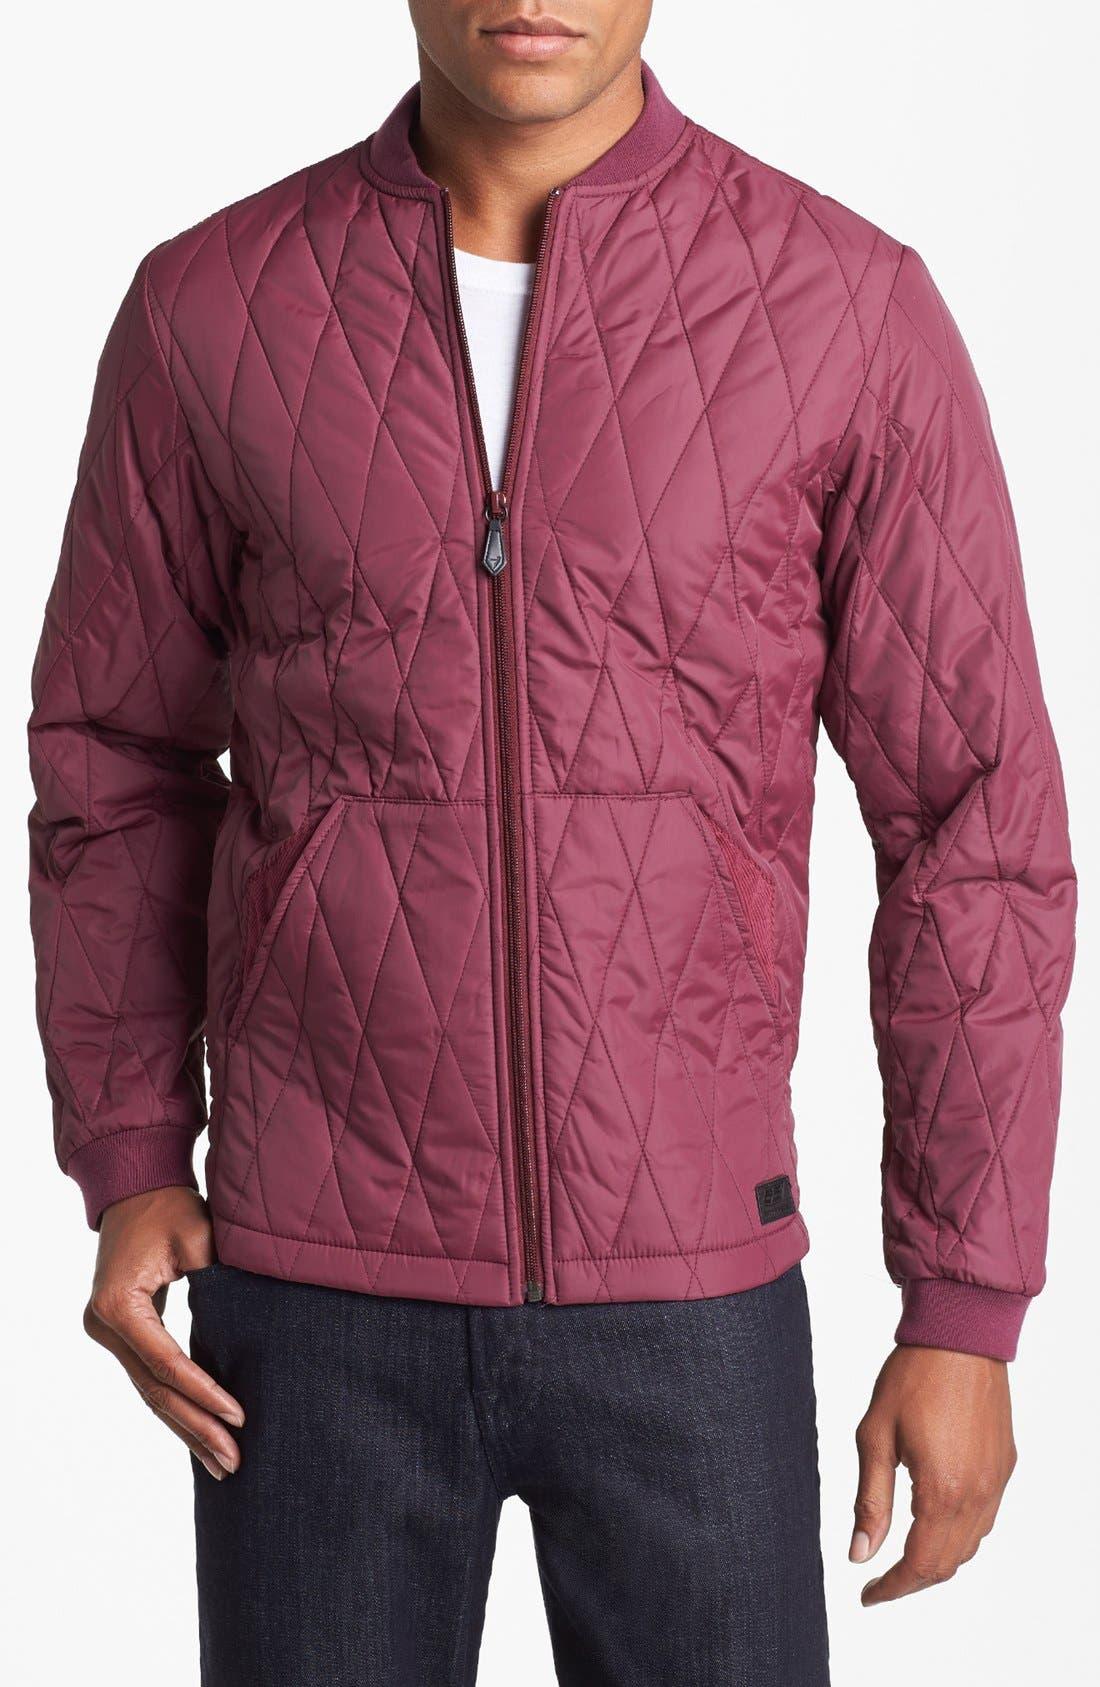 Main Image - 55DSL 'Japalm' Jacket